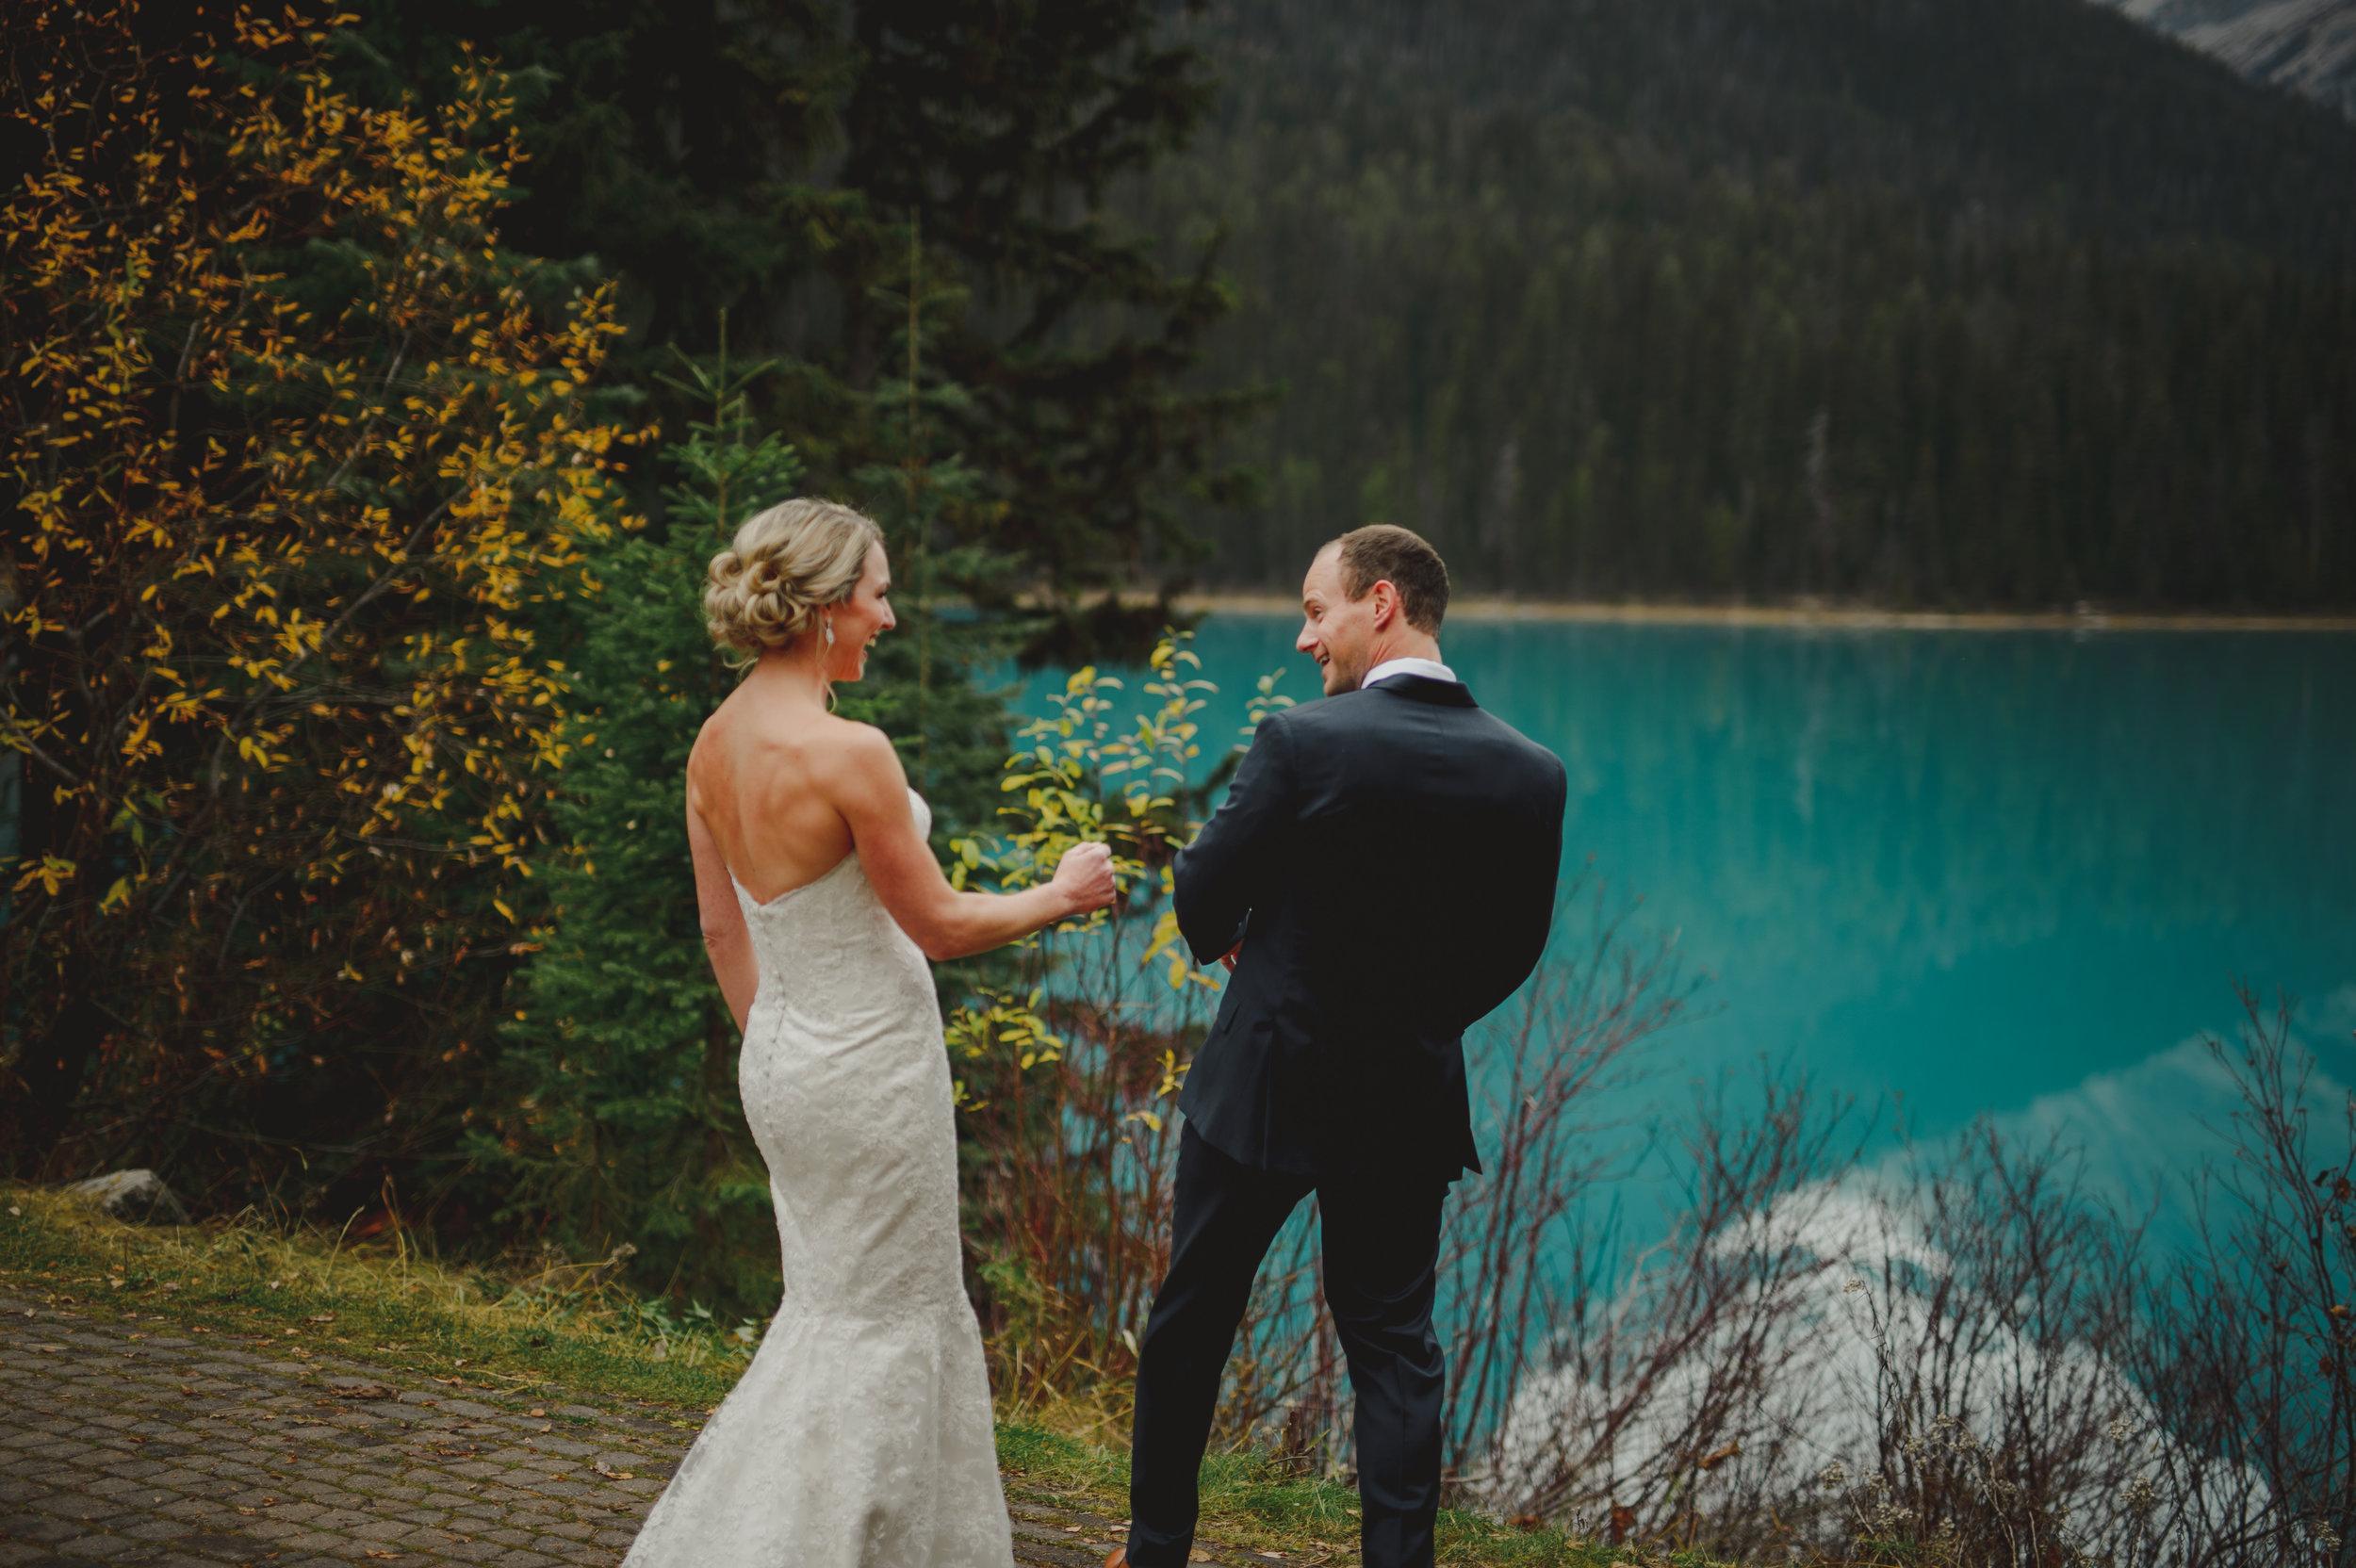 Banff-Wedding-Photographer-7.jpg